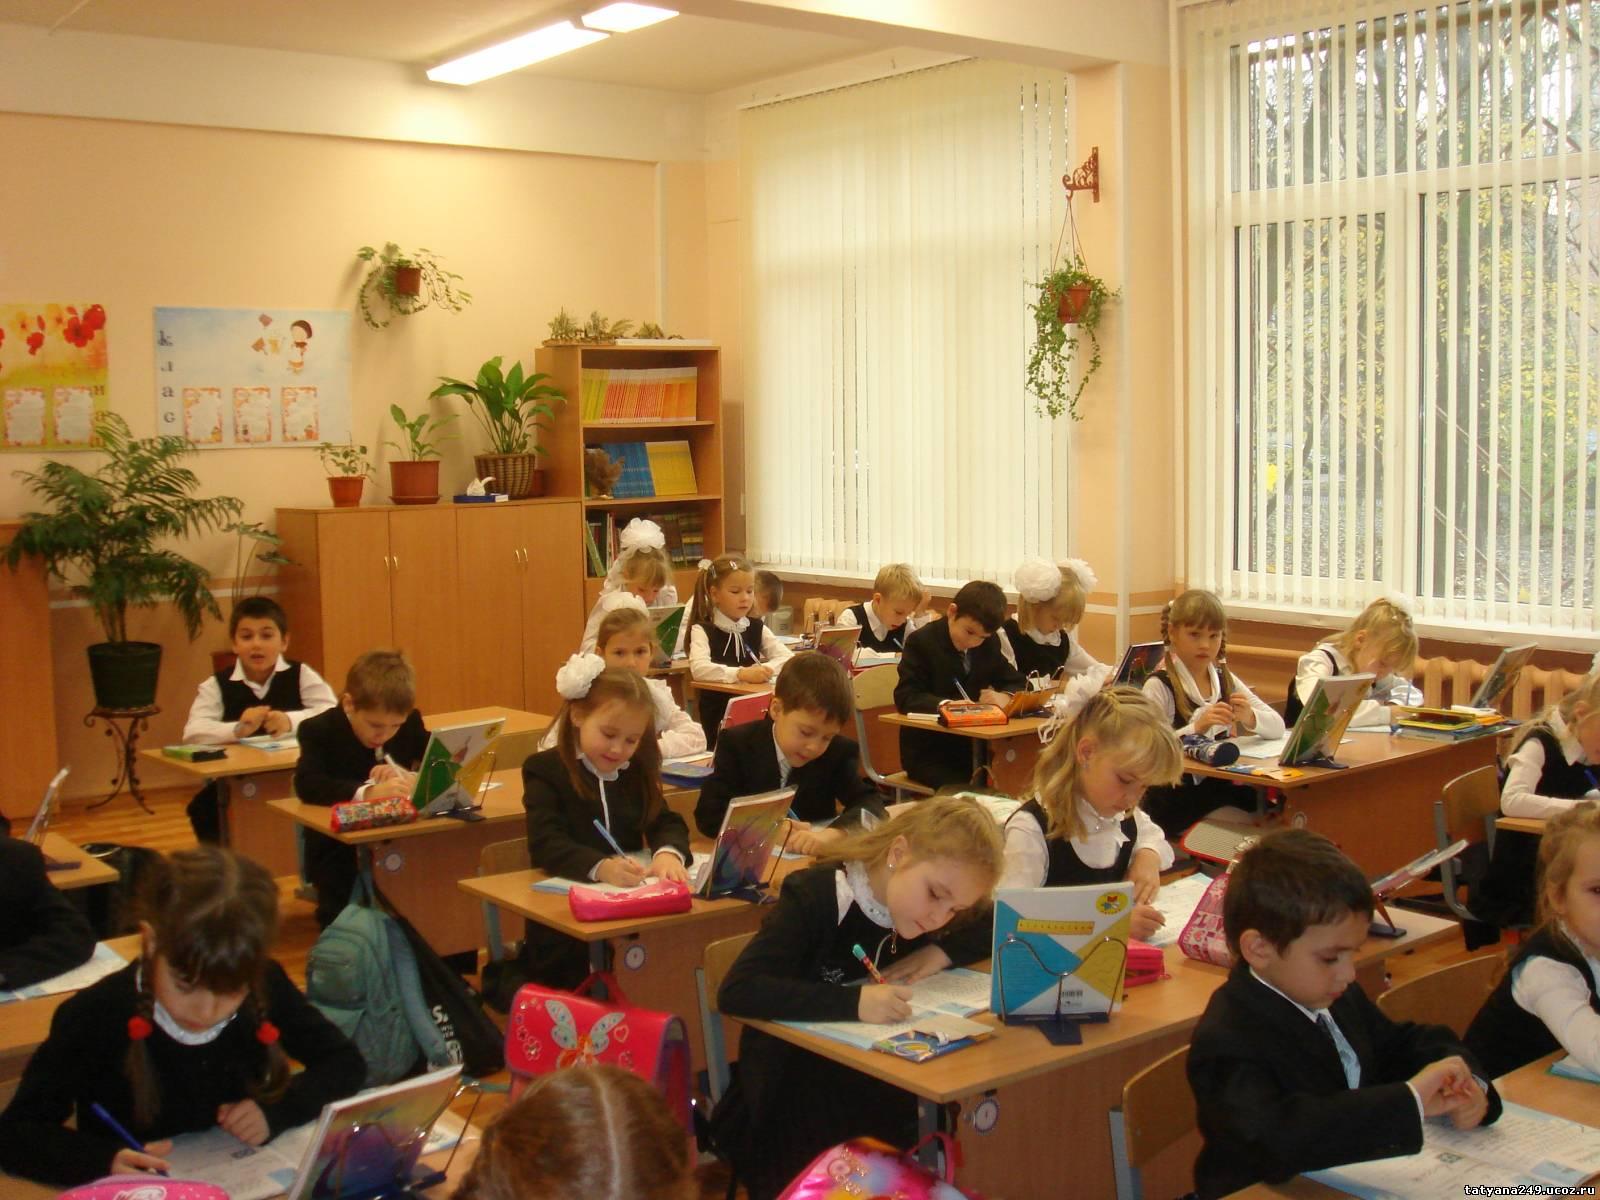 Фото детей в школе 2 класс